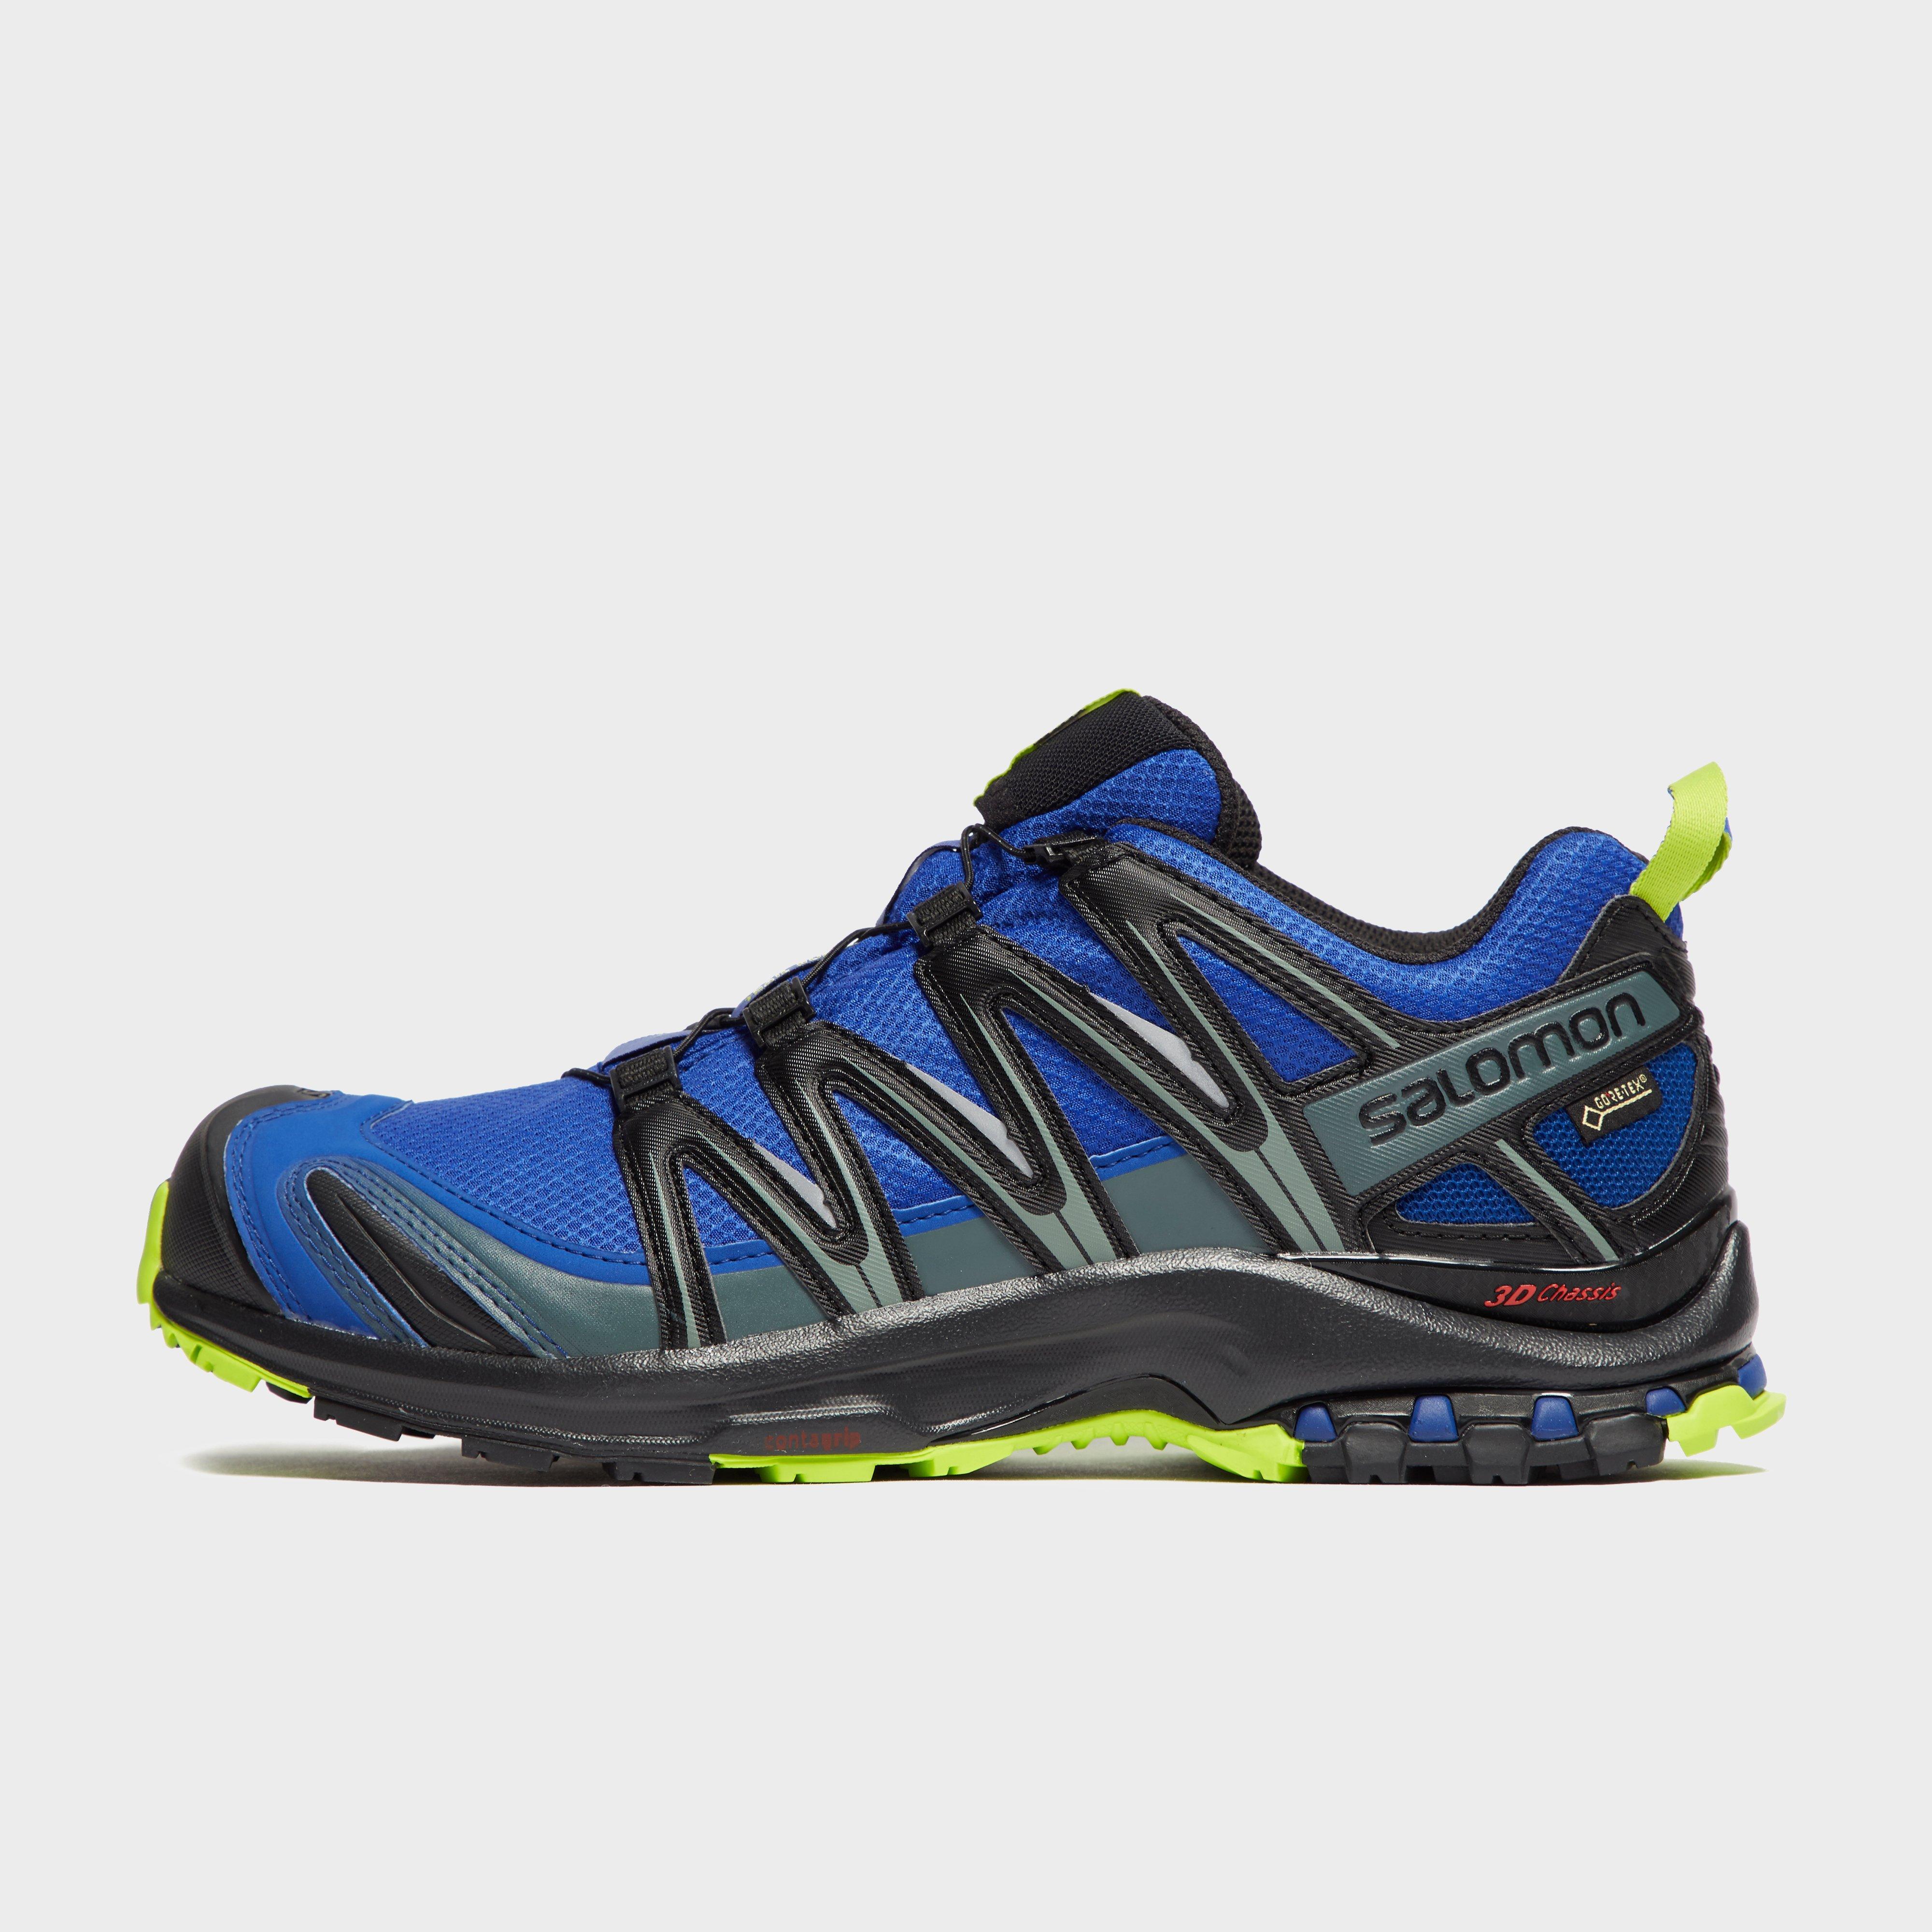 d71648515e29 Salomon Men s XA Pro 3D GORE-TEX® Trail Running Shoes image 1